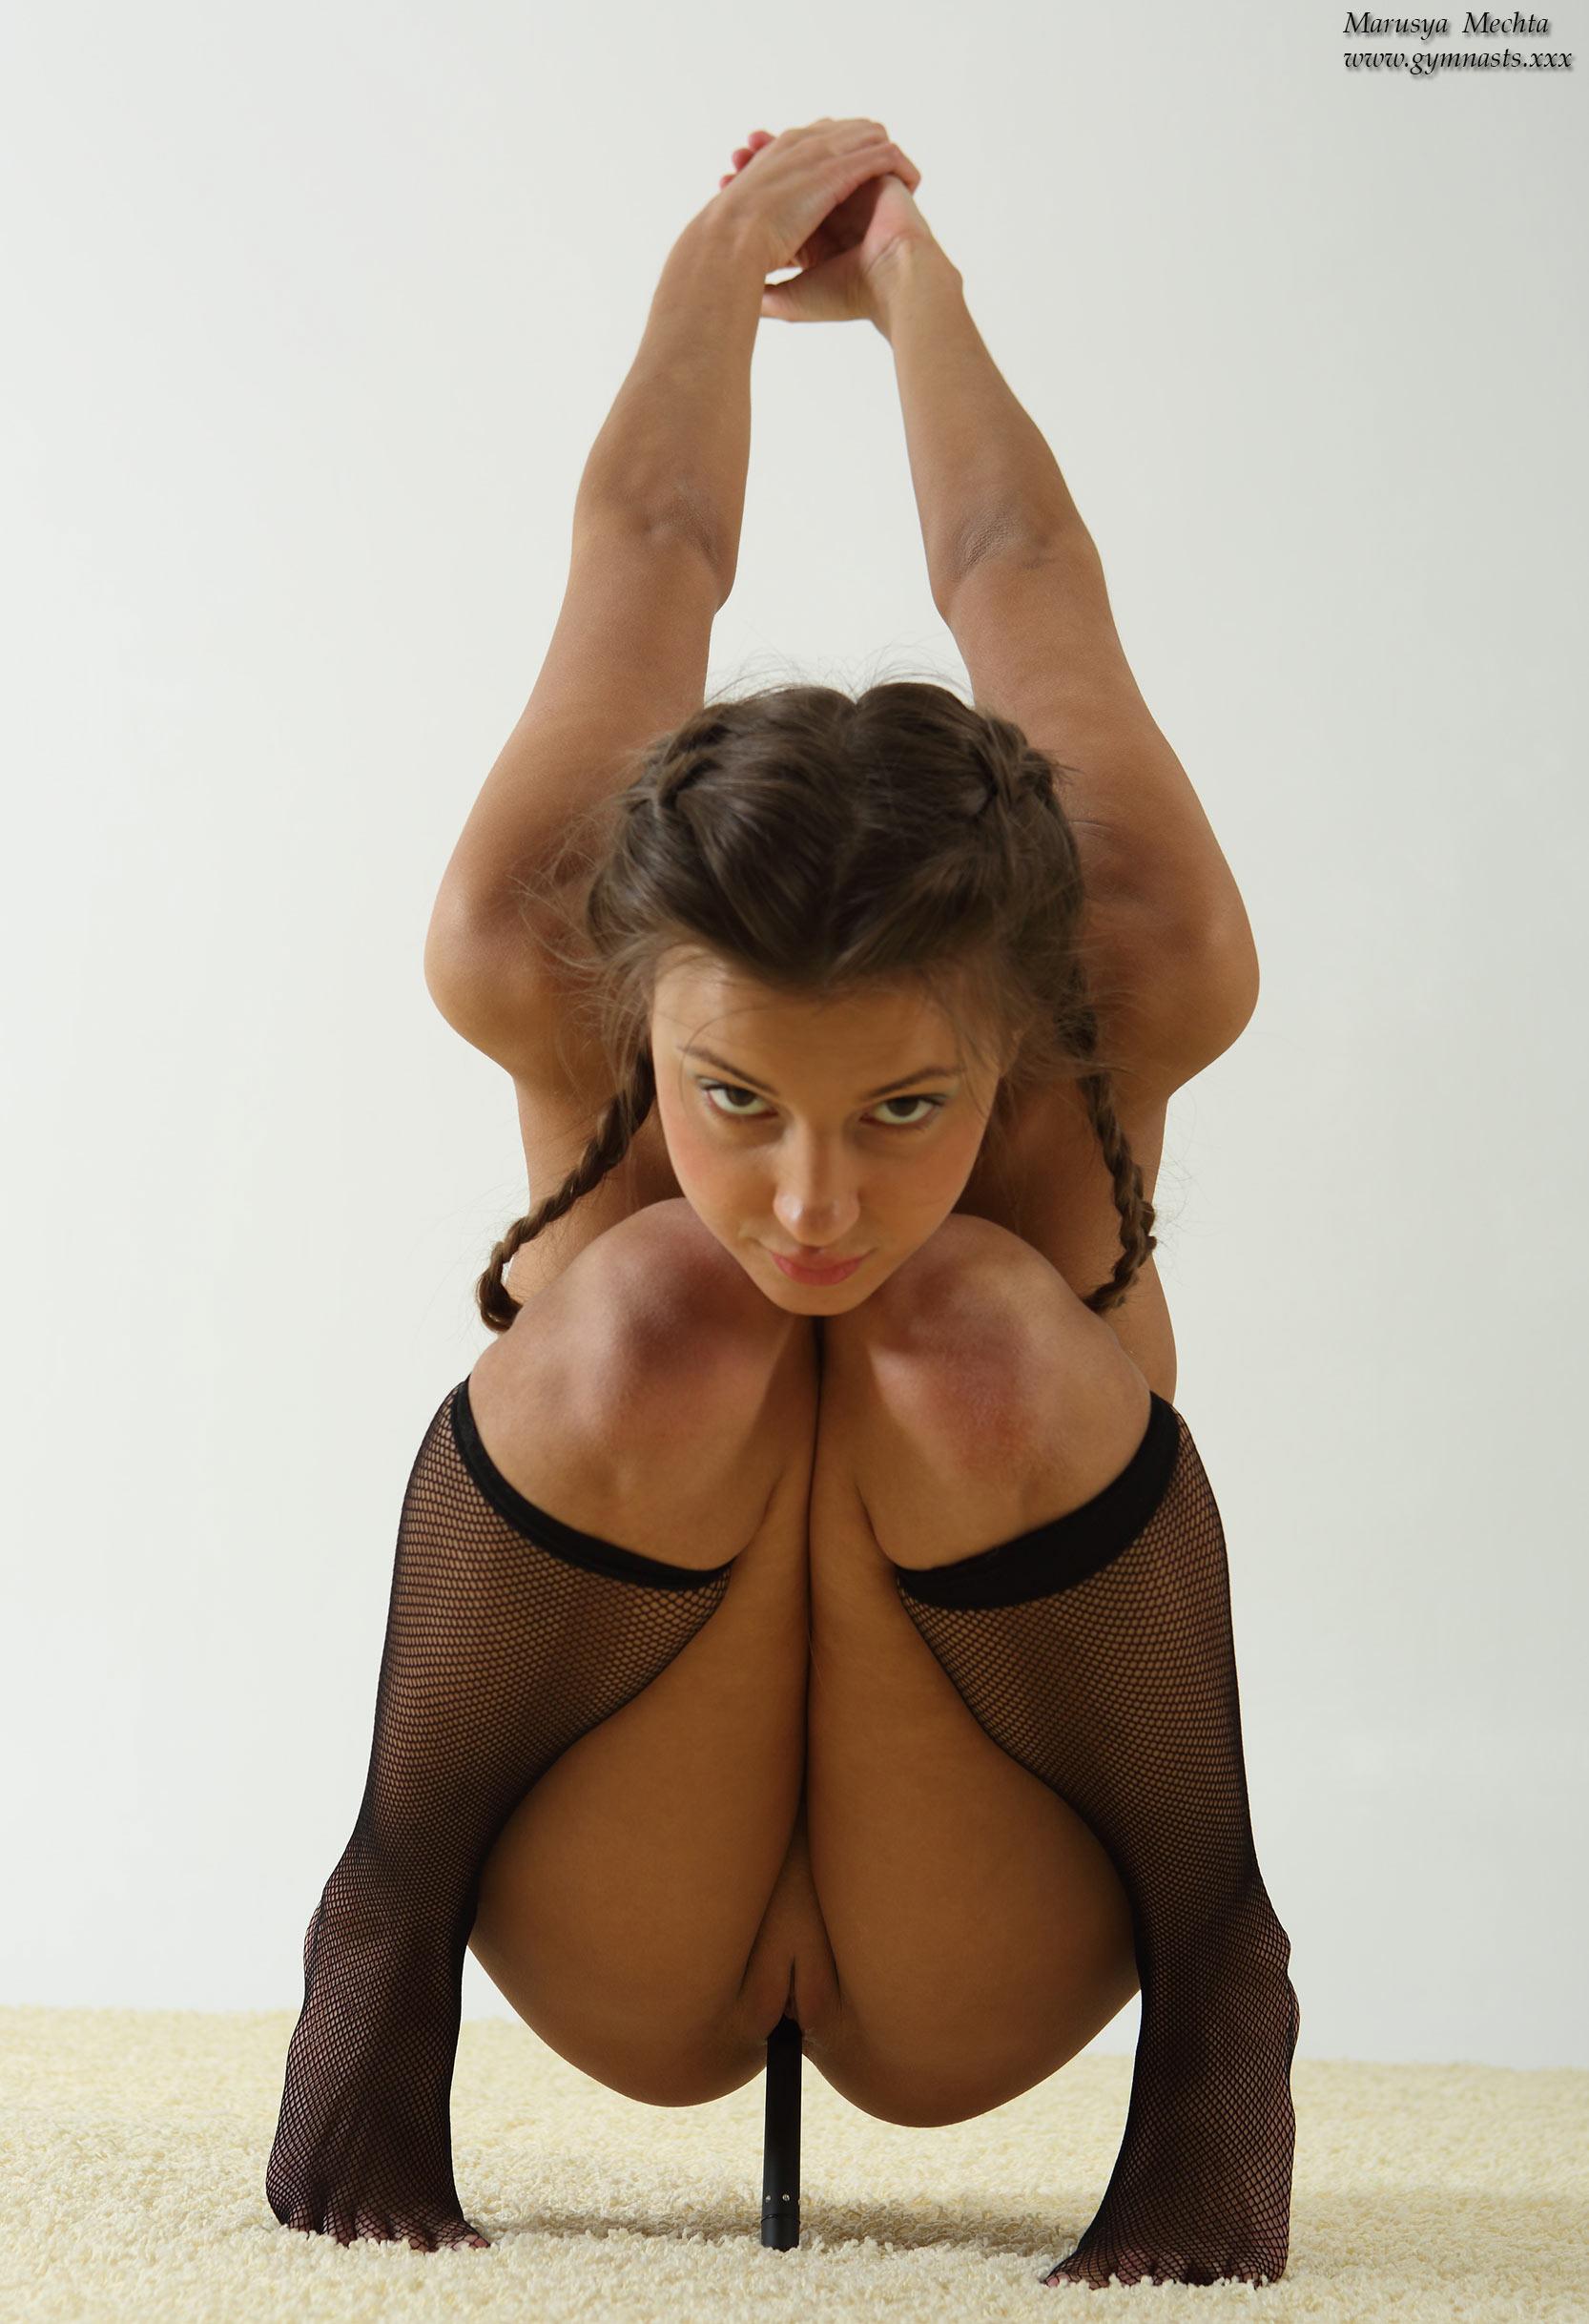 Yogasex